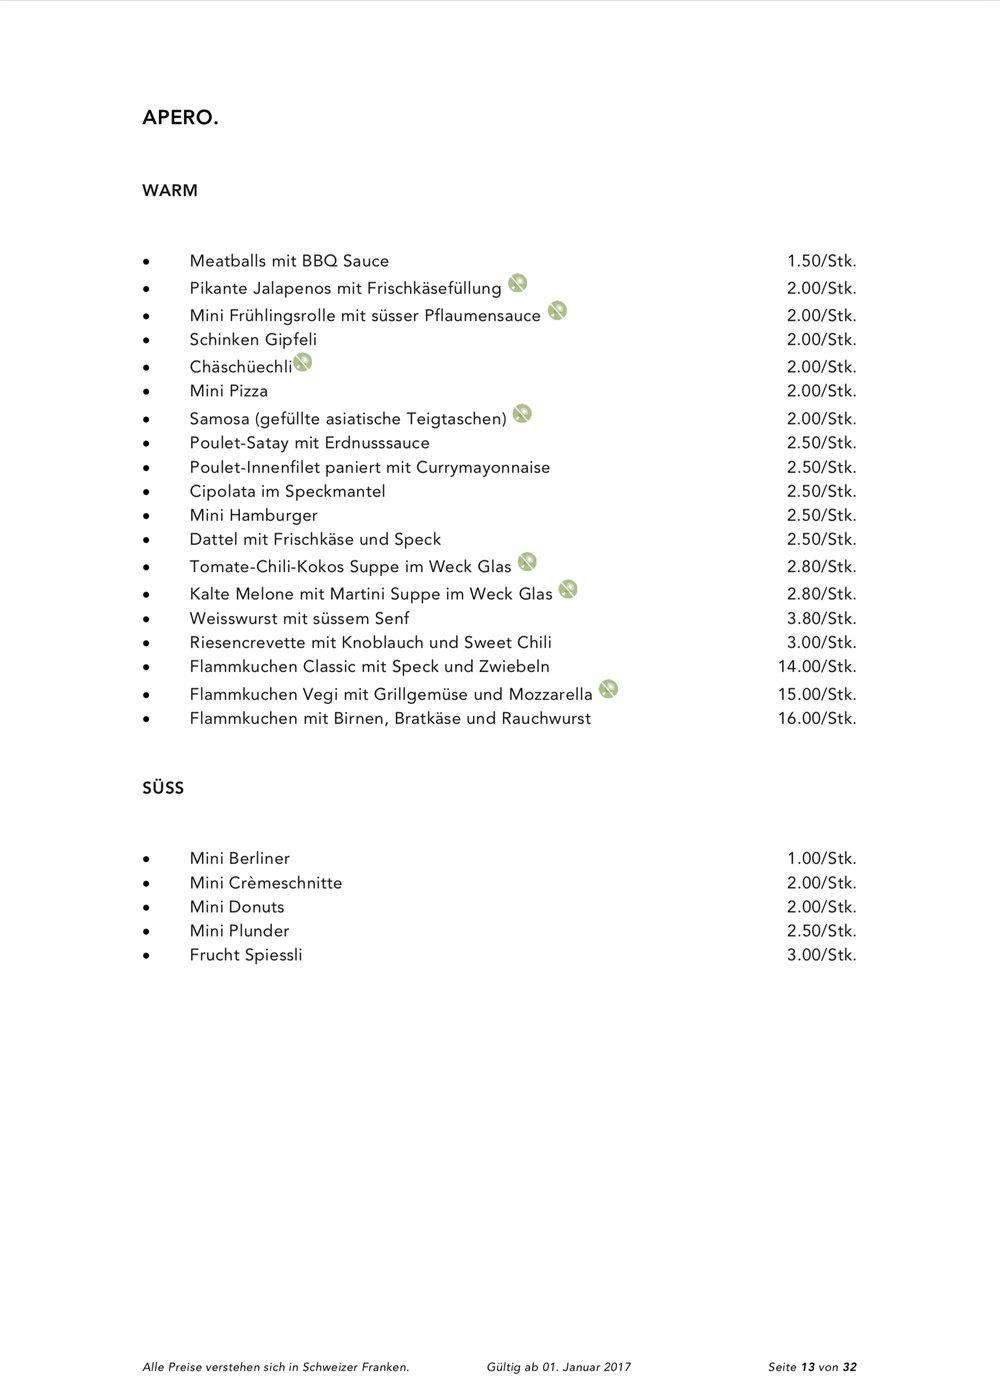 Bankettdokumentation-schlemmerei-partnersingmbh.jpg